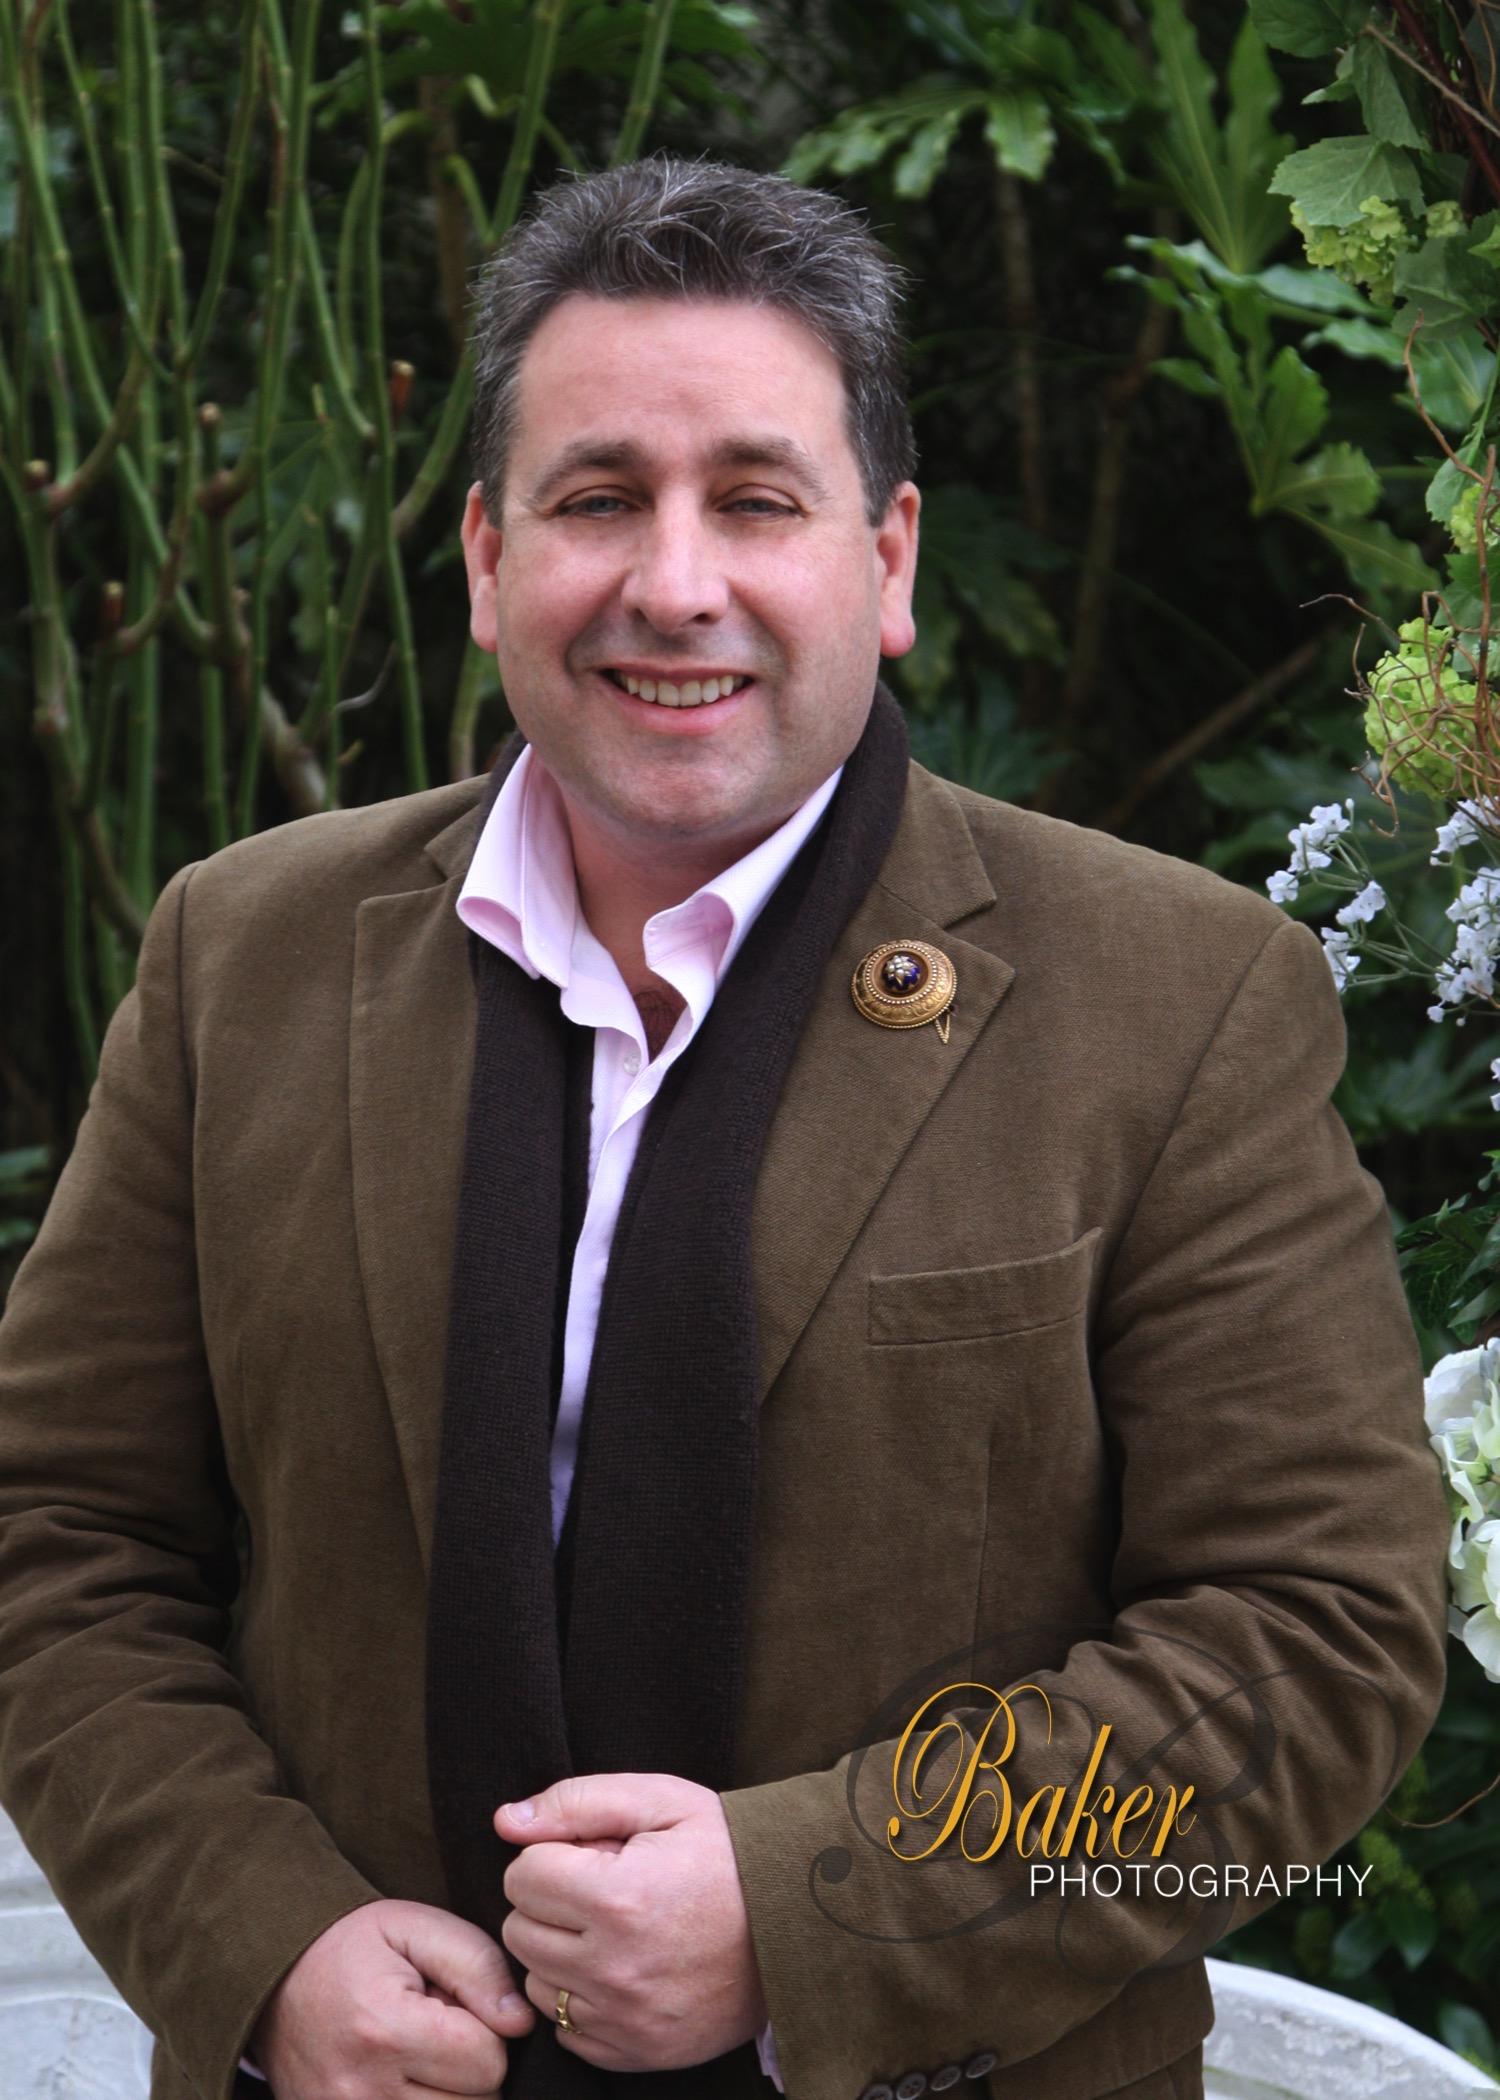 Franc at The Charleville Park Hotel